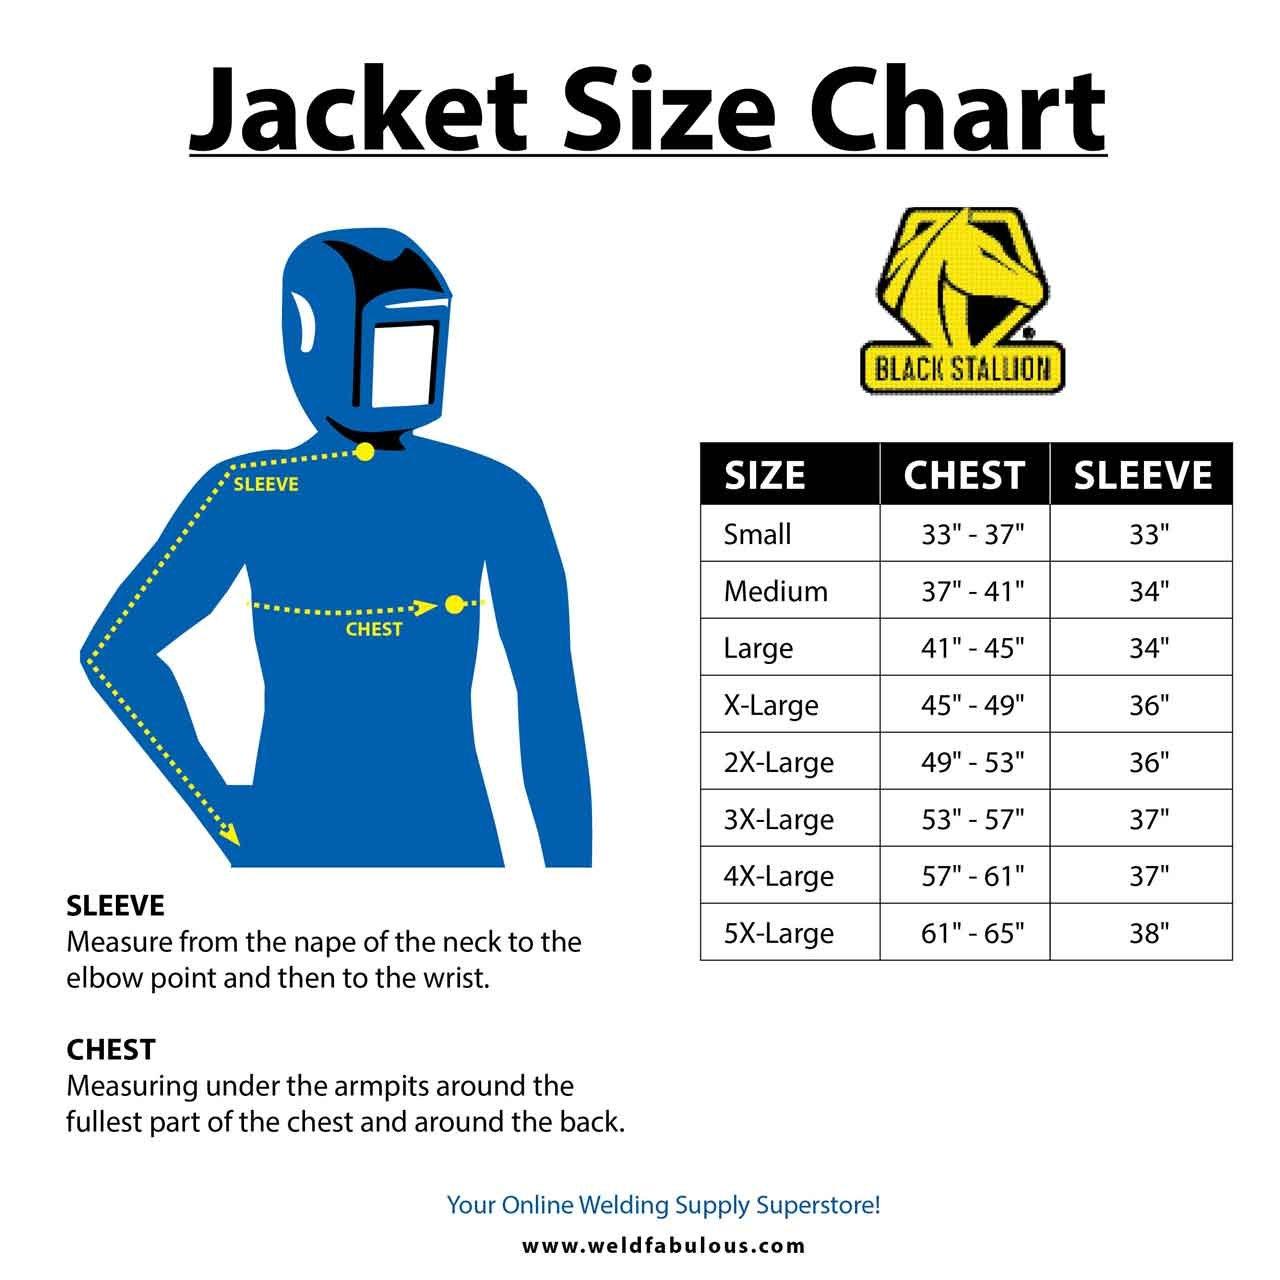 Revco JF1012-OR 30'' Hi-Vis 9 oz. Flame Resistant Cotton Welding Jacket by Black Stallion (Image #4)